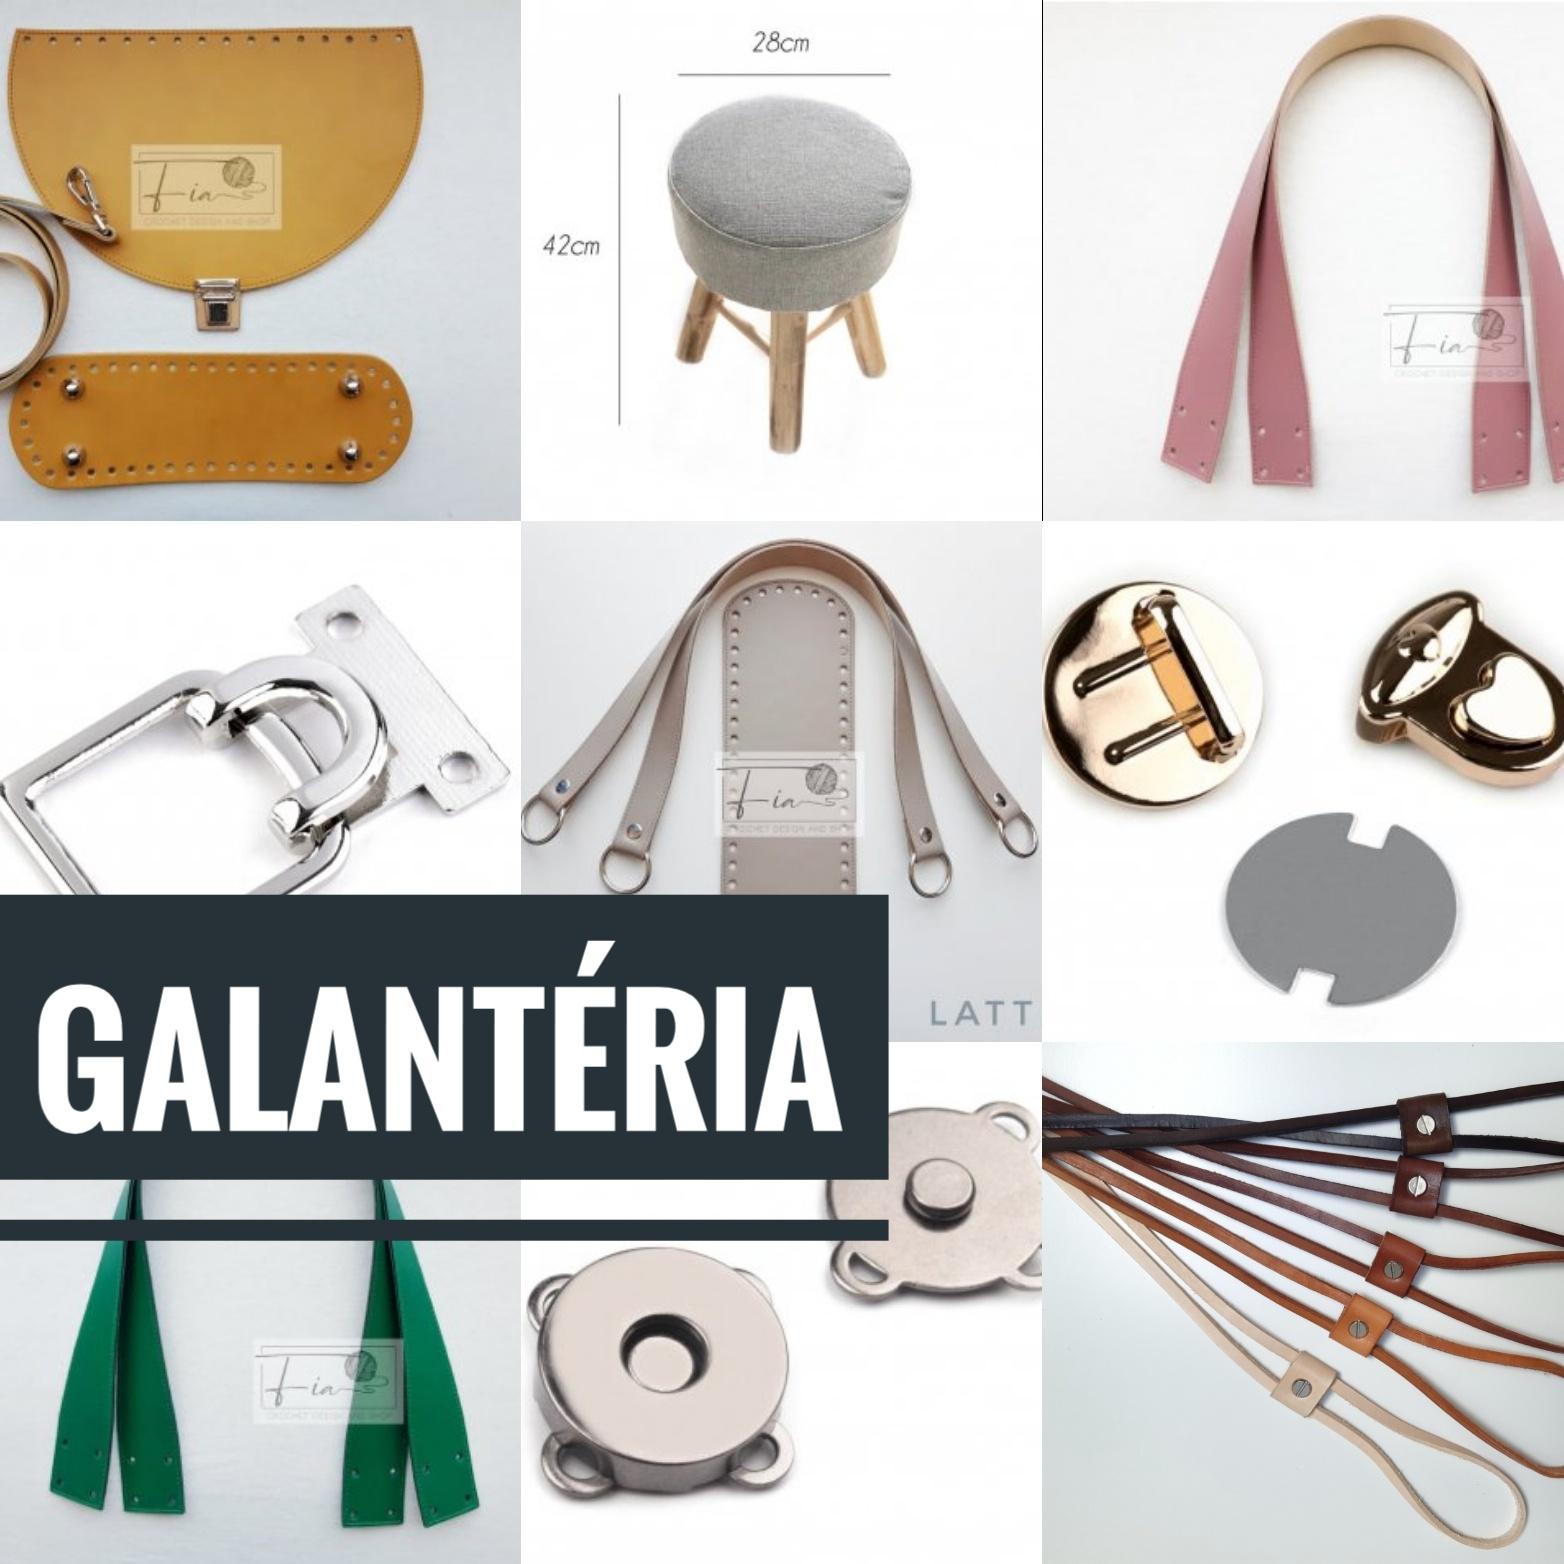 Galanterka